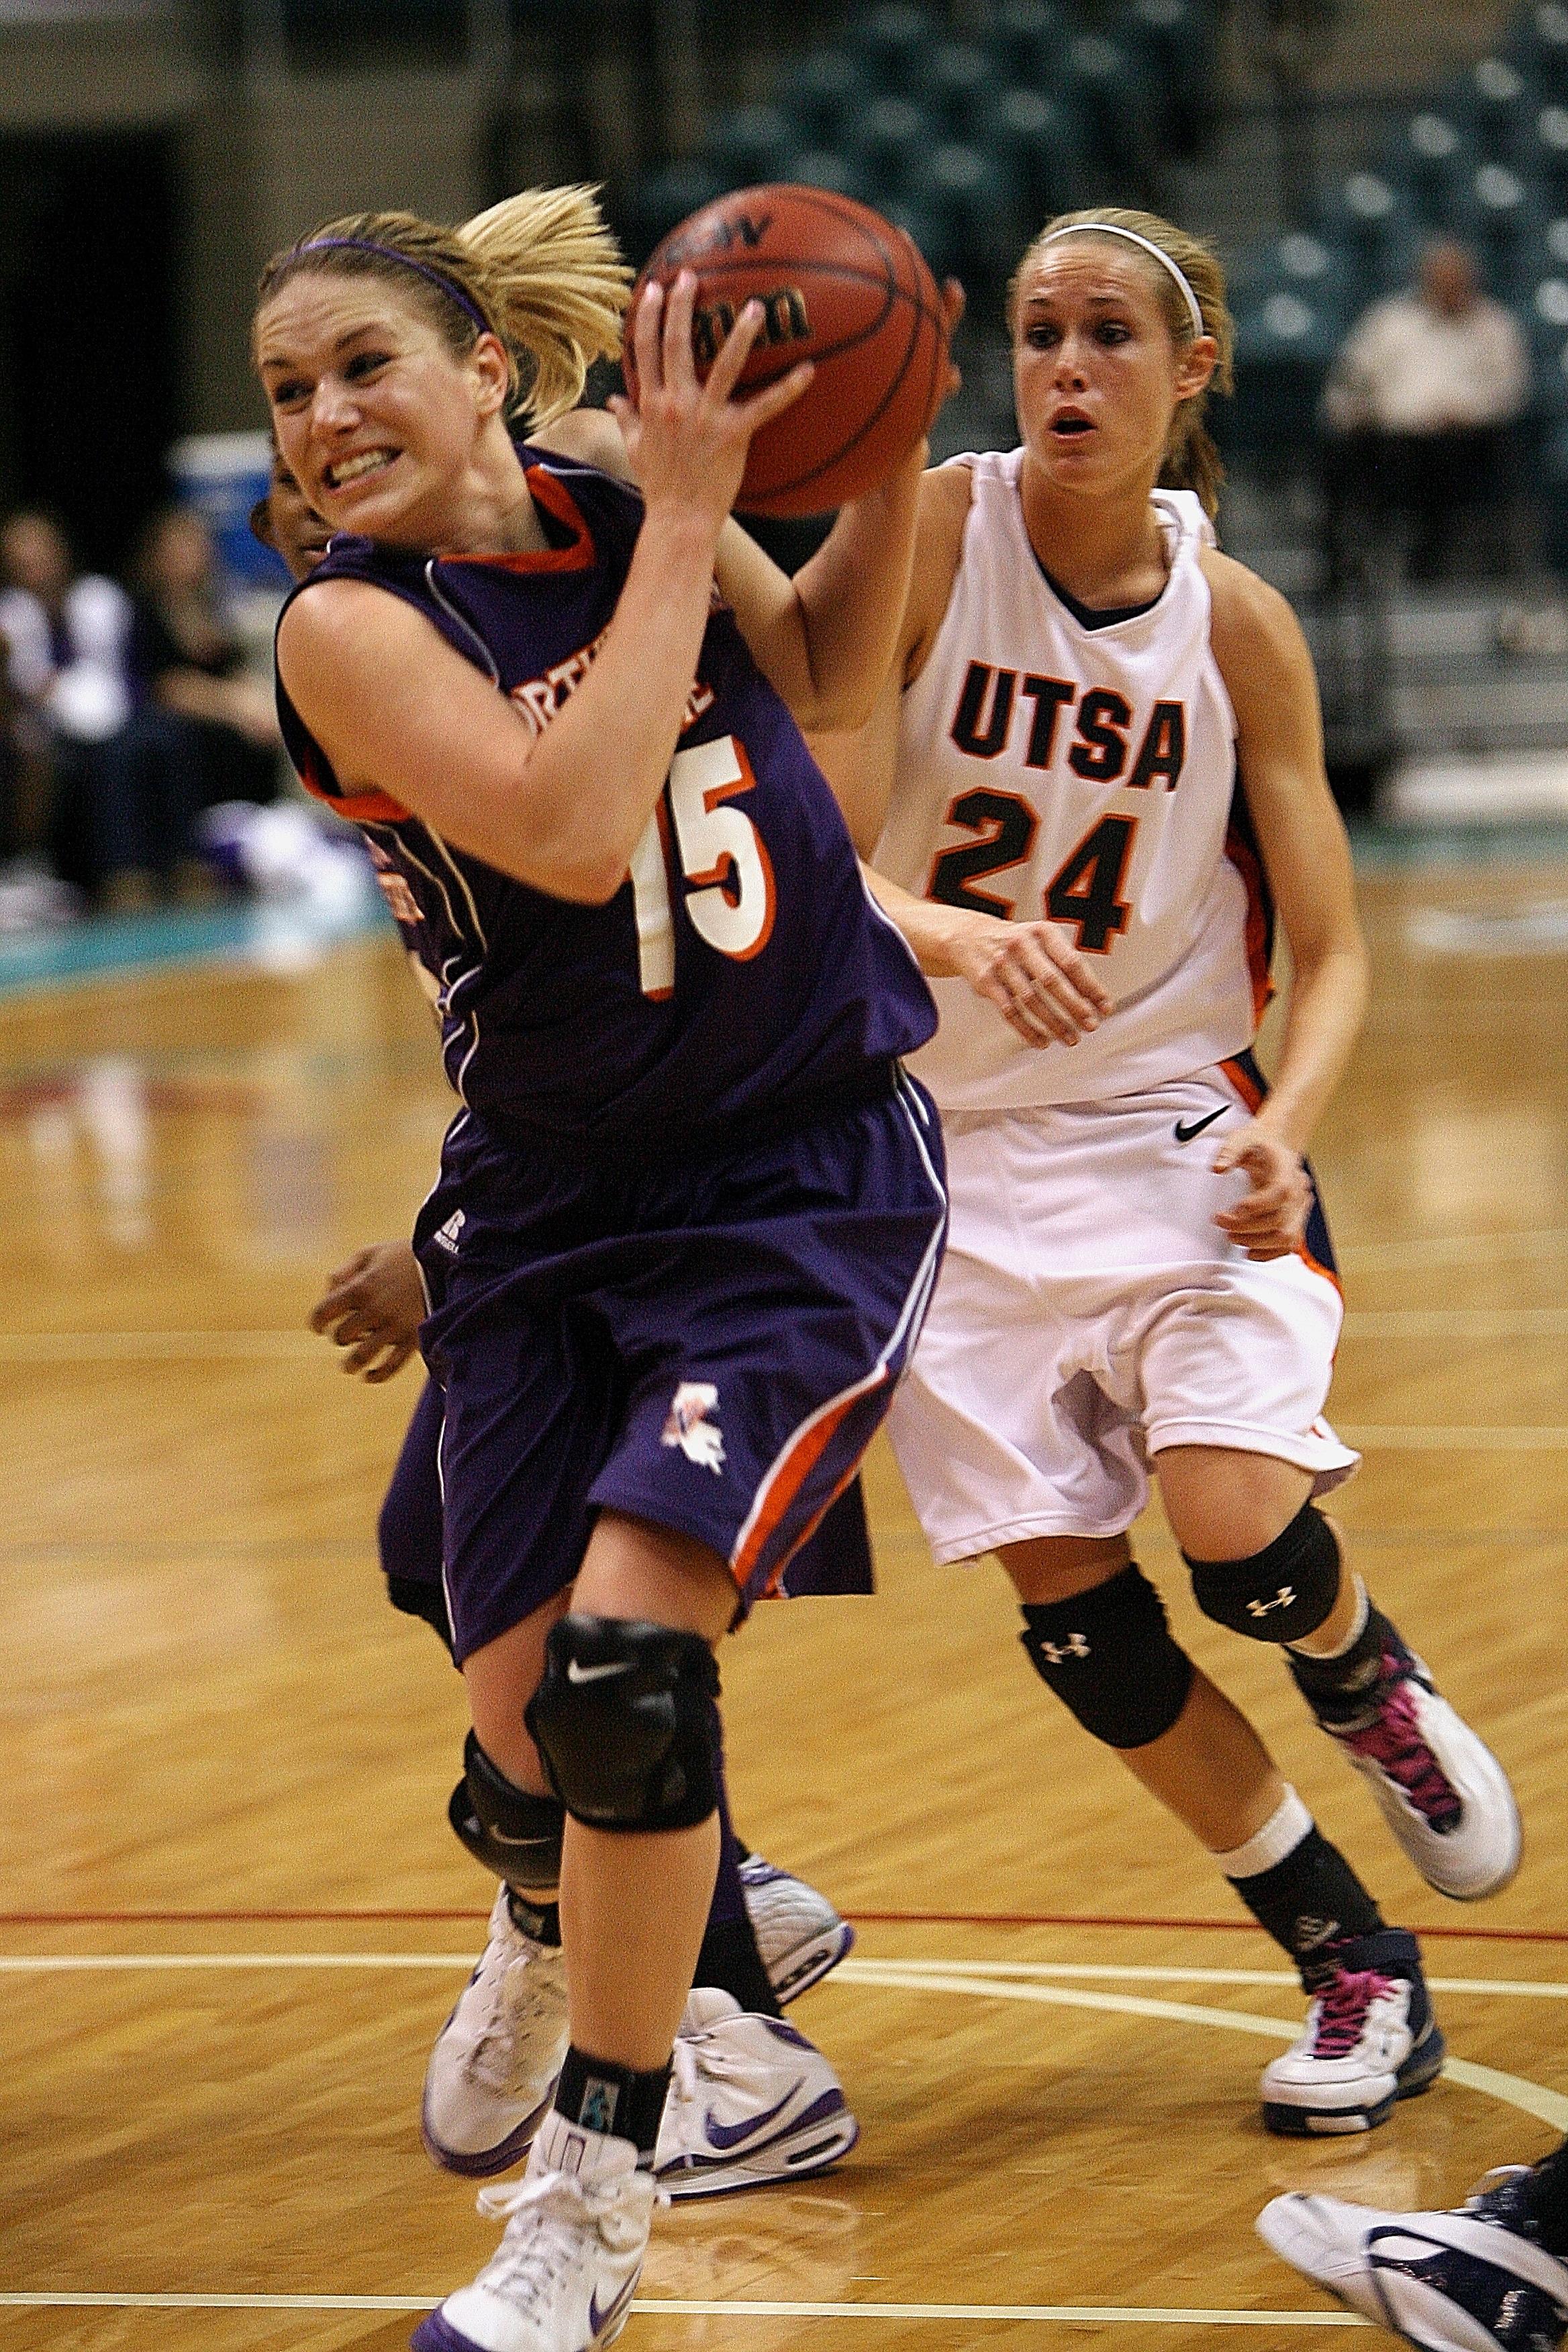 omens basketball girl - HD1200×1800